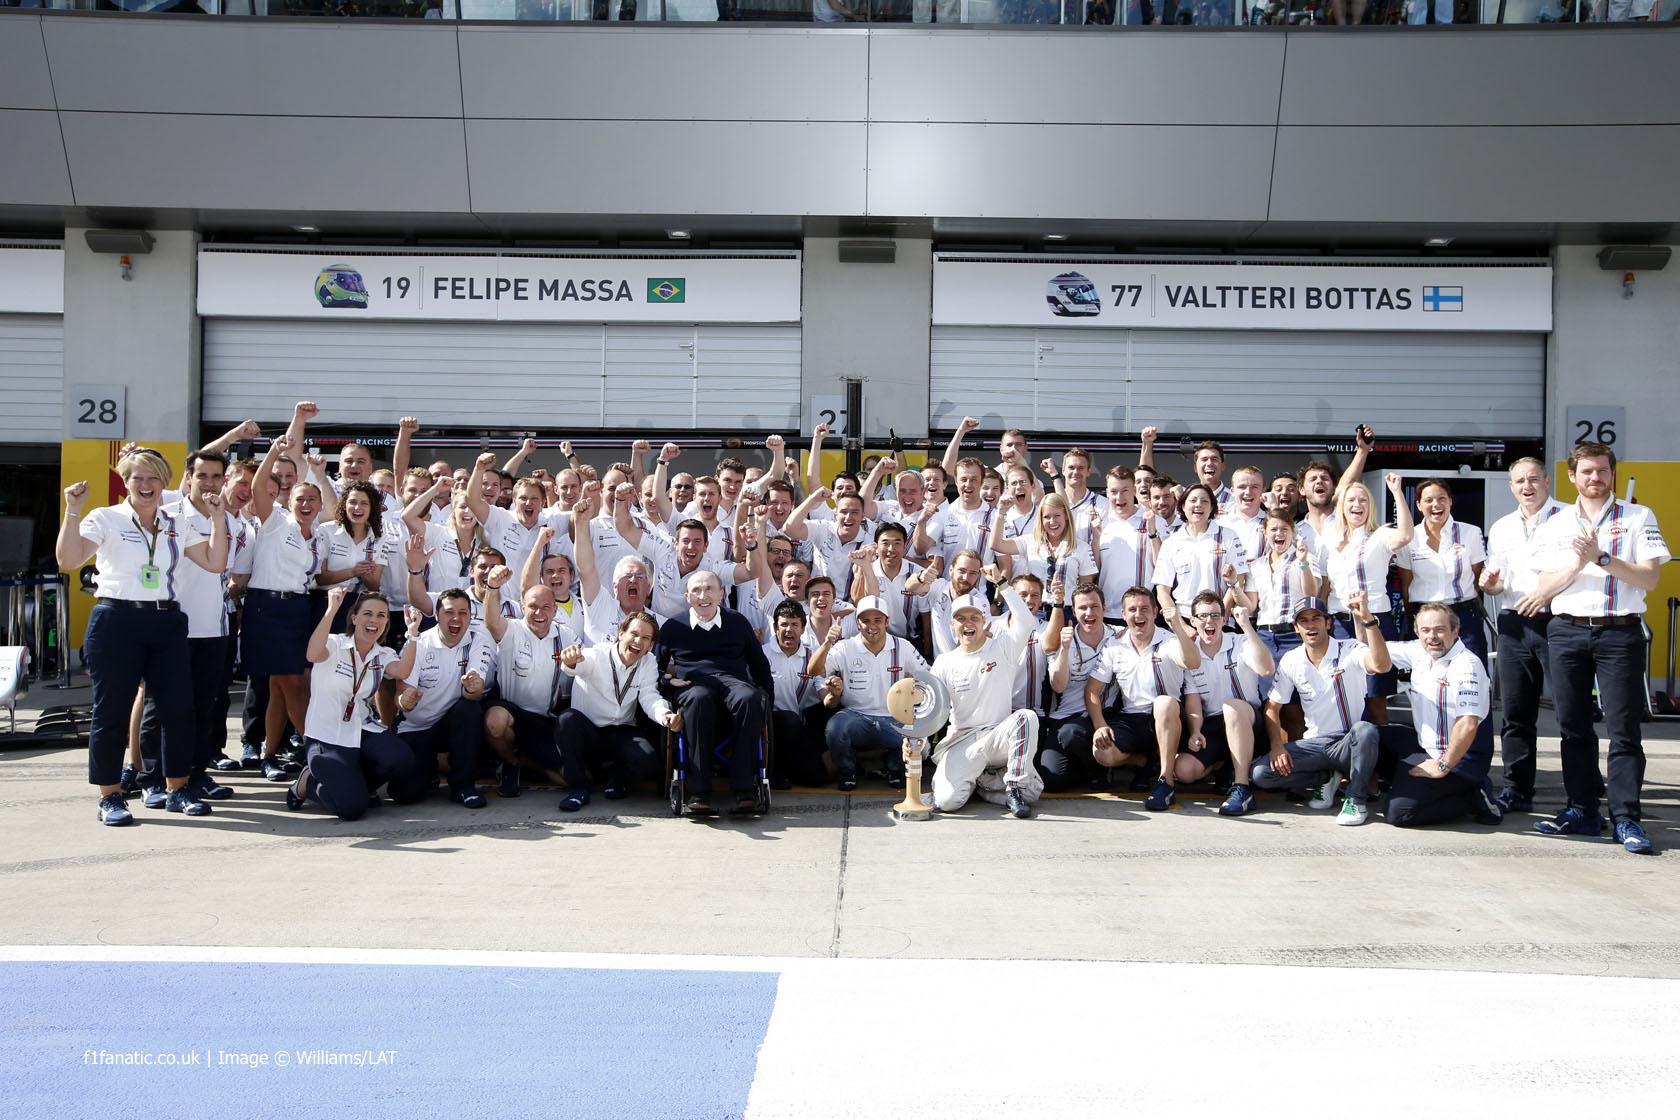 Frank Williams, Valtteri Bottas, Felipe Massa, Williams, Red Bull Ring, 2014